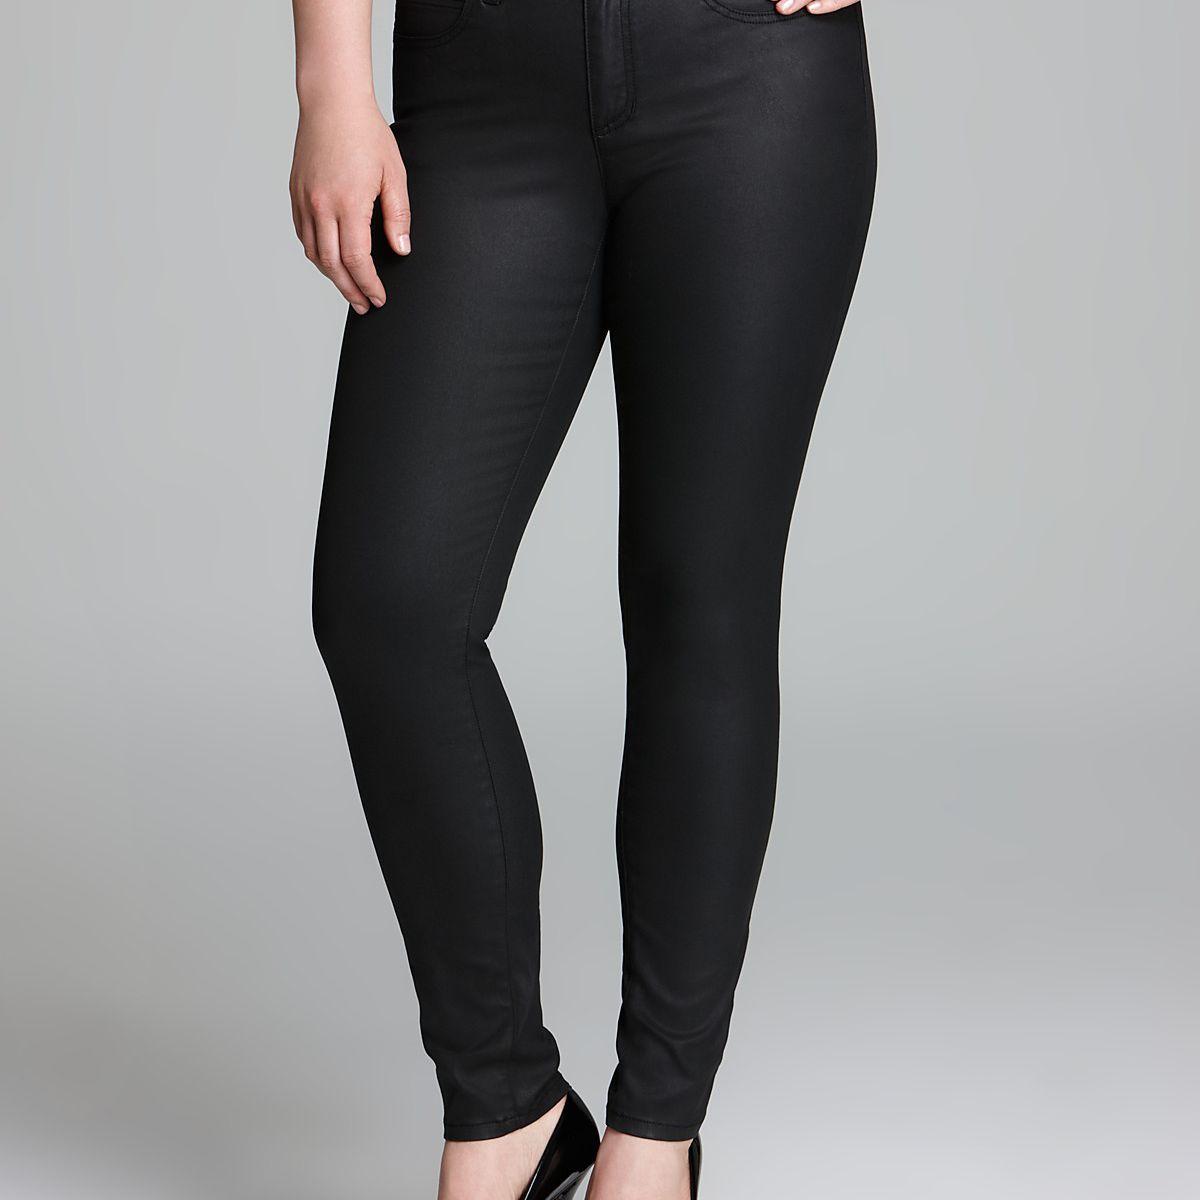 nydj-sheri-plus-size-skinny-jeans.jpg